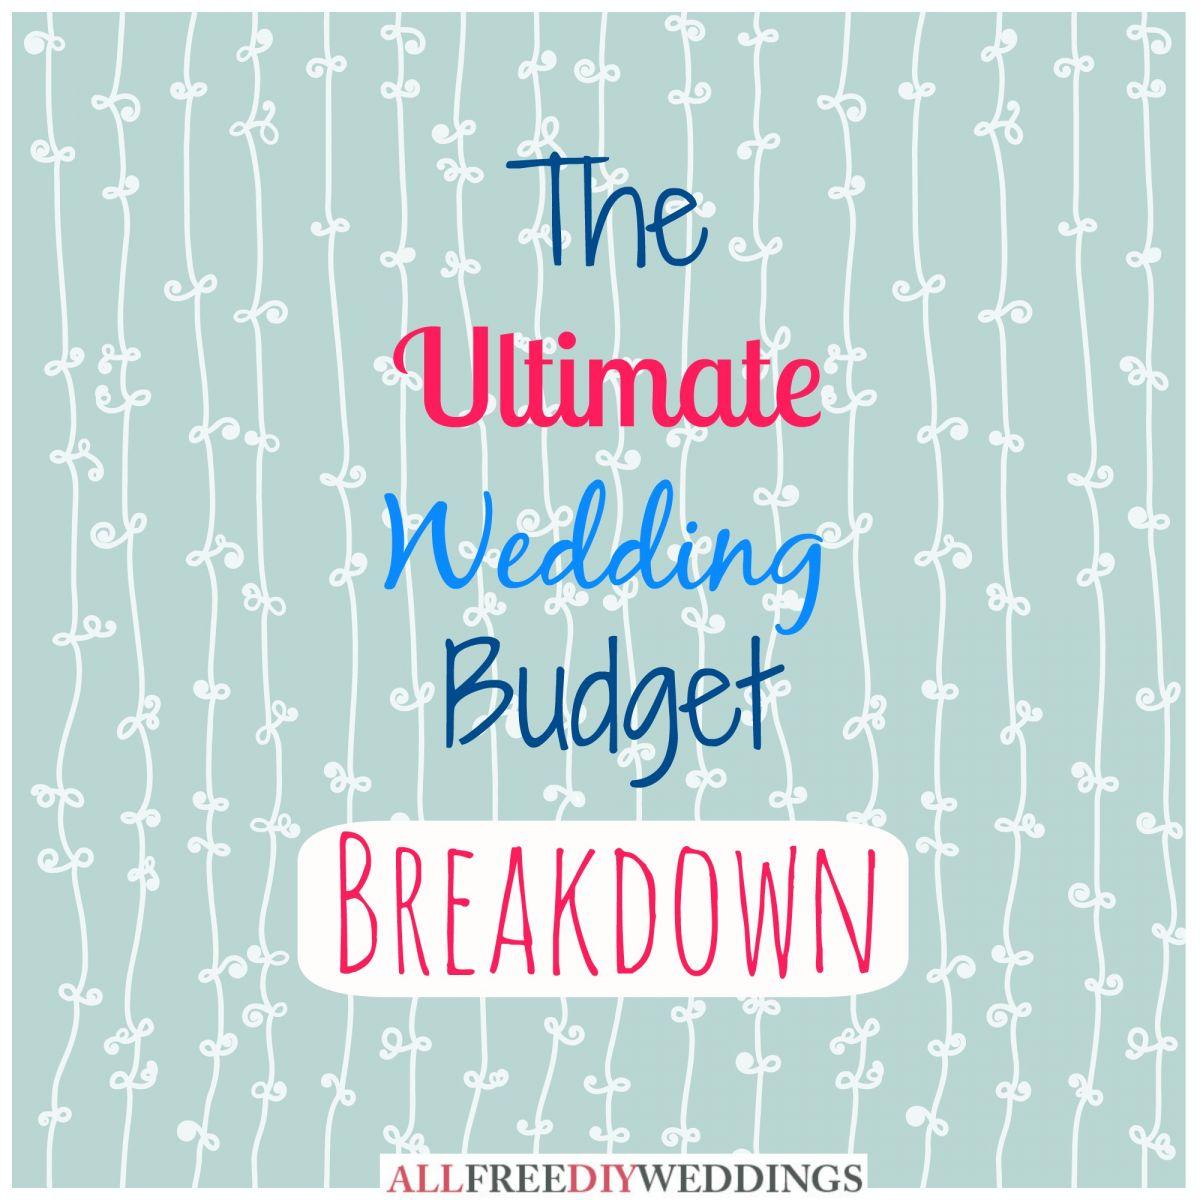 Wedding planning wedding budget breakdown allfreediyweddings diy wedding planning wedding budget breakdown junglespirit Choice Image